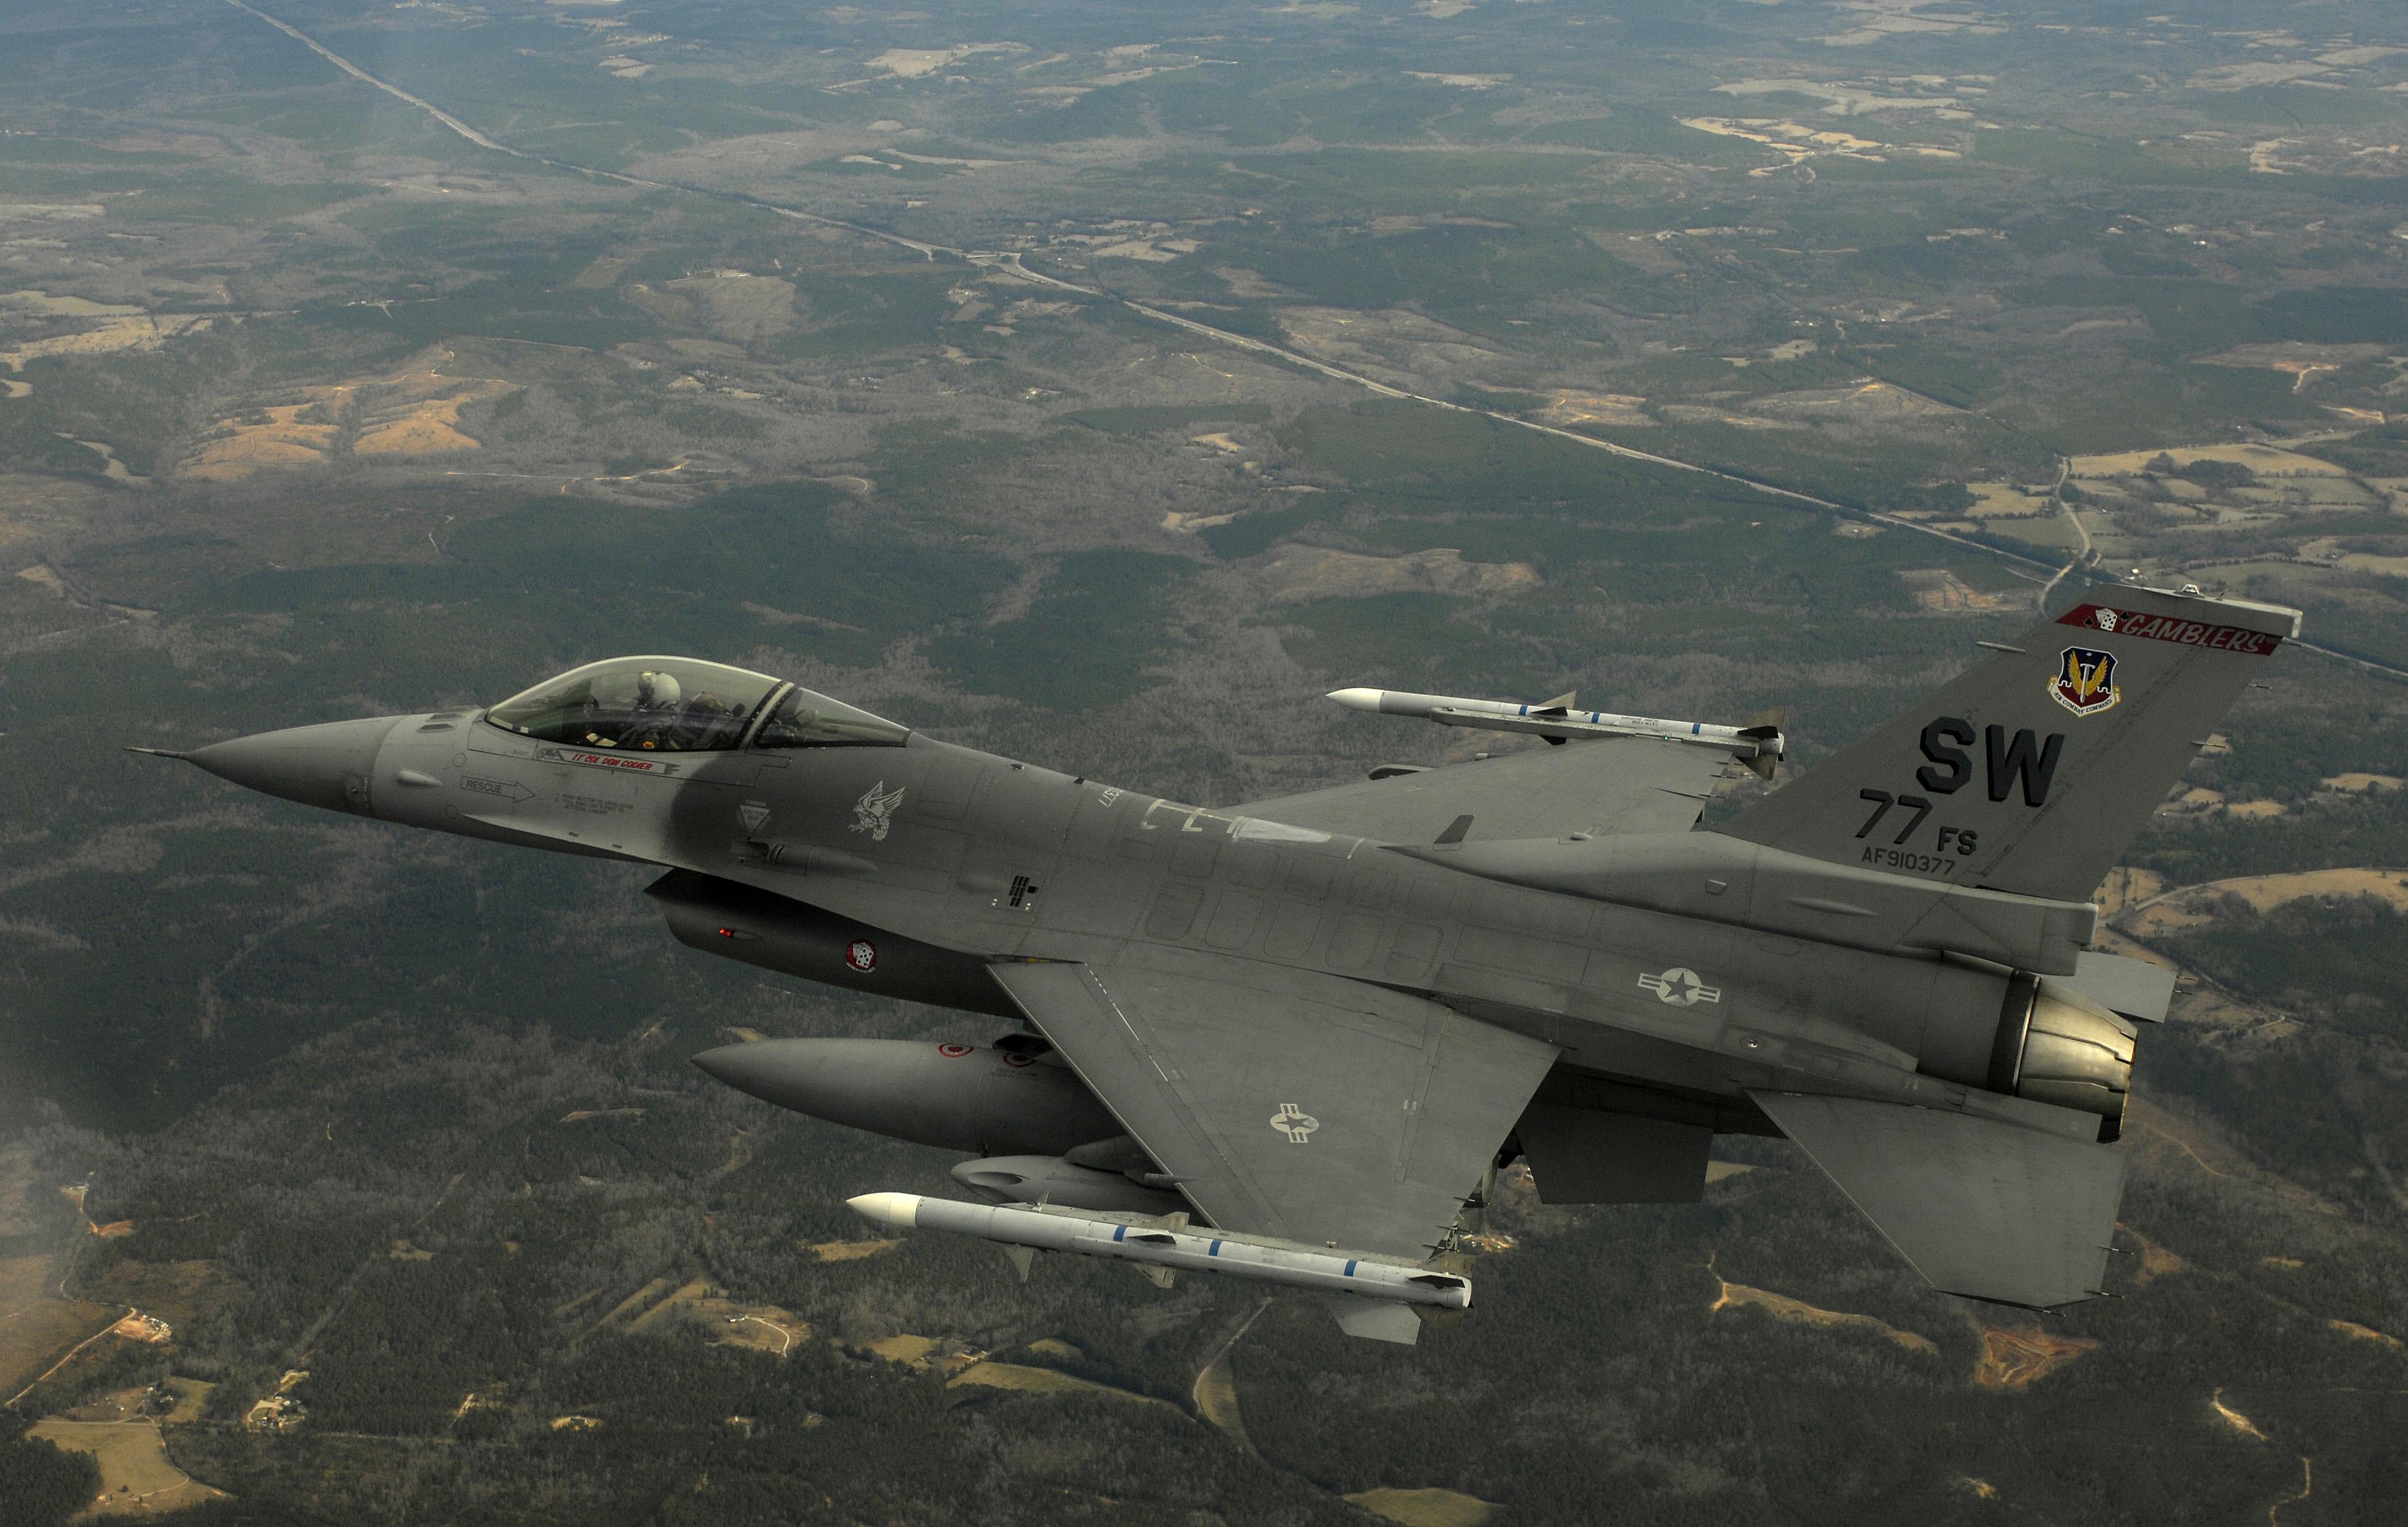 http://upload.wikimedia.org/wikipedia/commons/9/97/F-16CJ_Fighting_Falcon.jpg